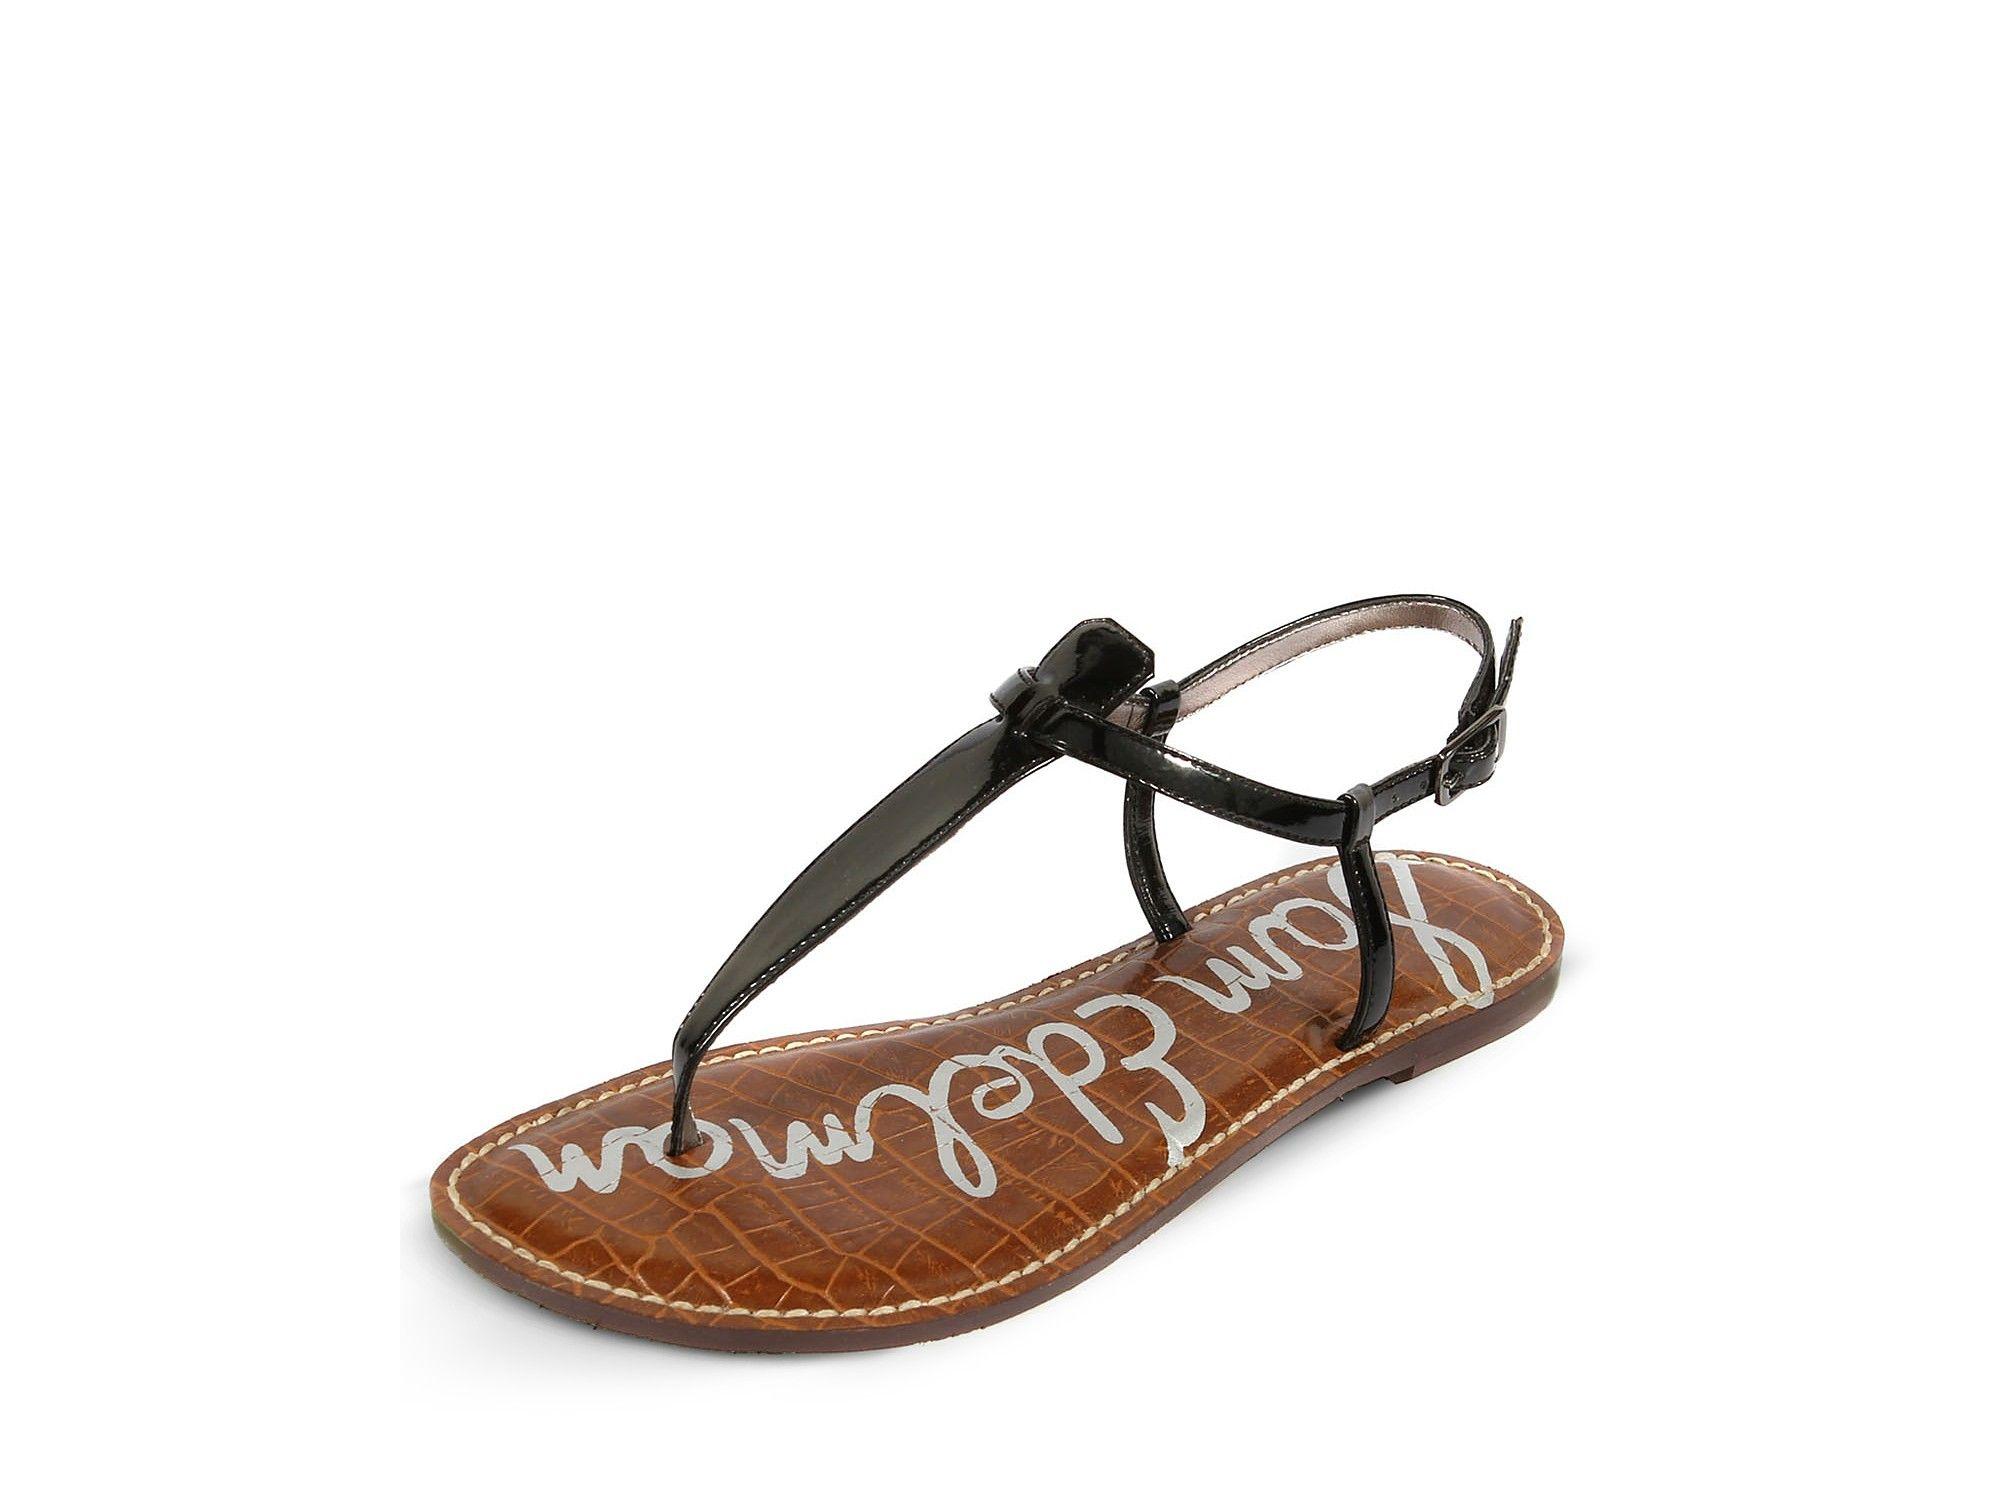 f5efc220a23 Sam Edelman Black Sandals